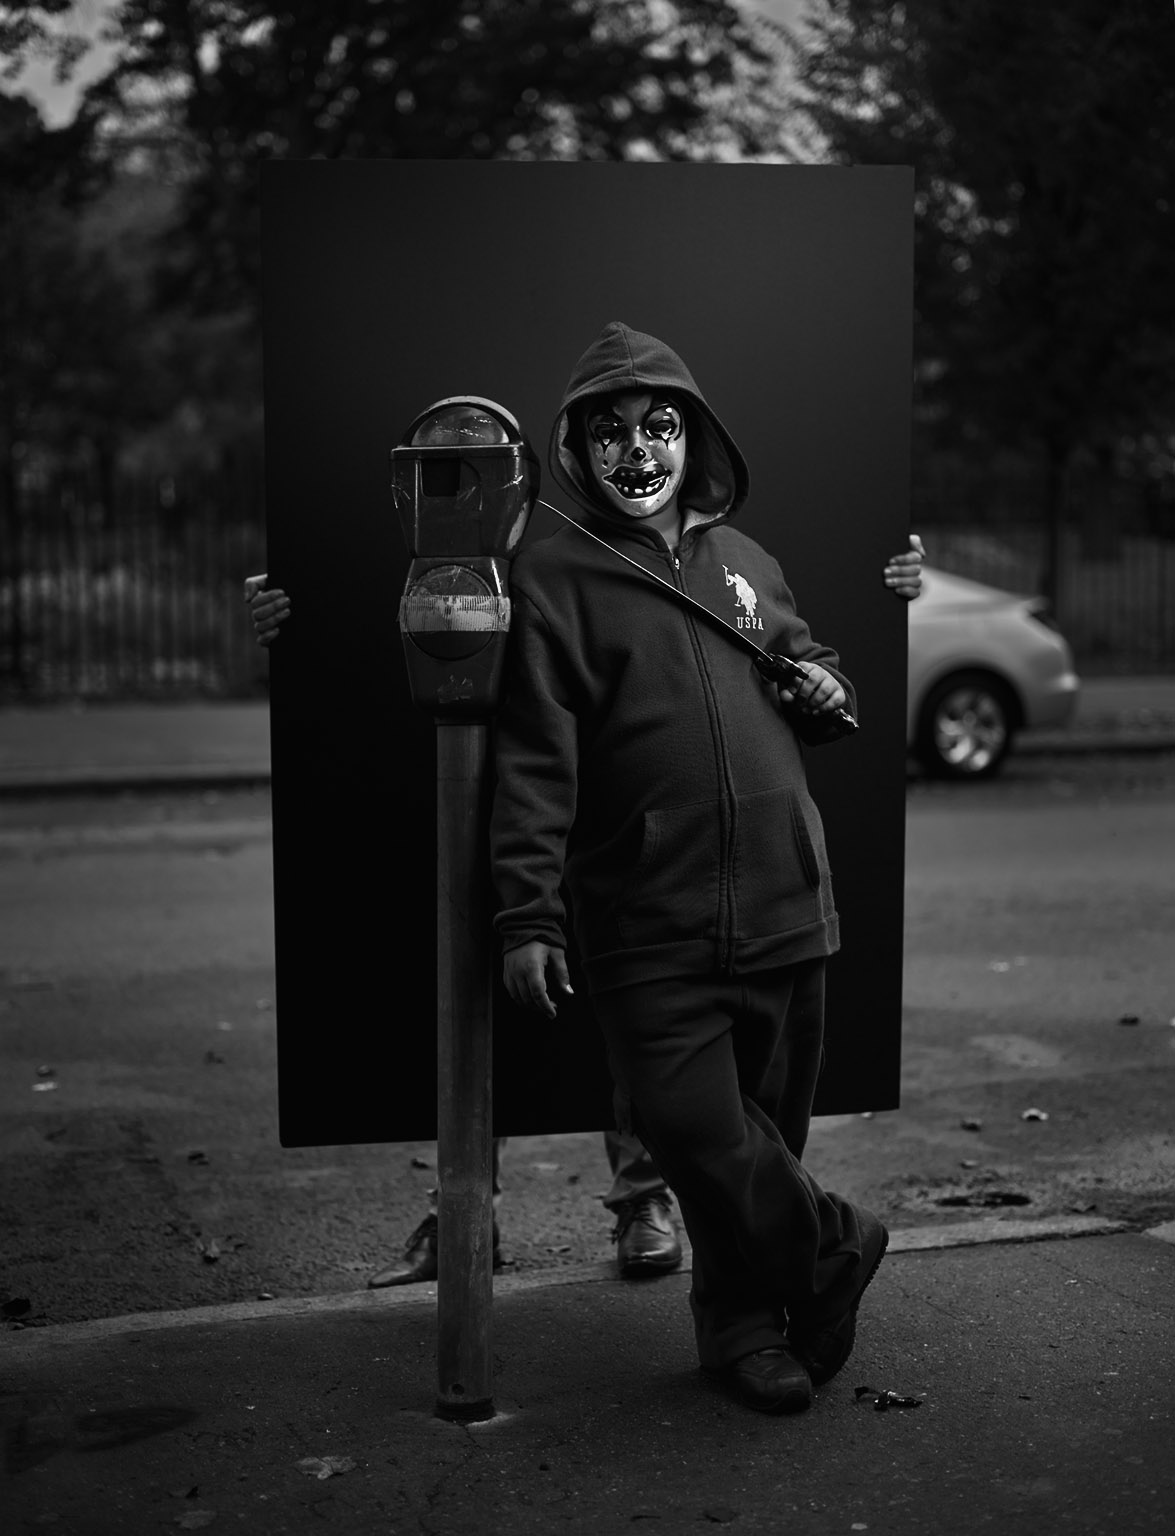 4:55pm October 31st, 2013 - Bushwick, Brooklyn